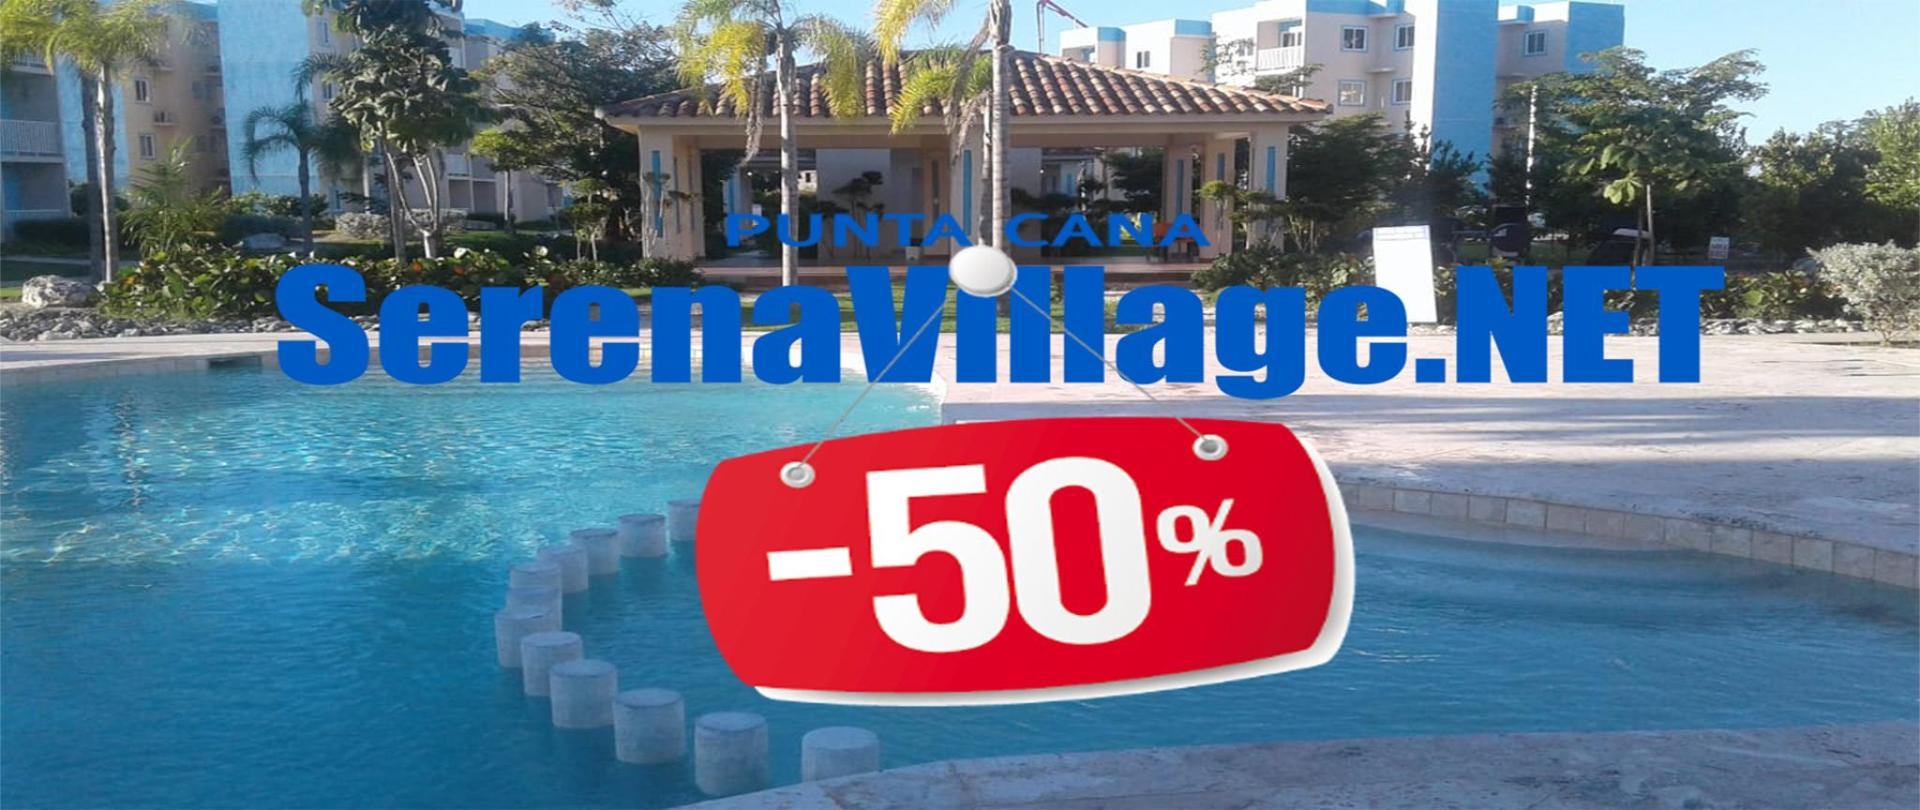 Serena Village.png